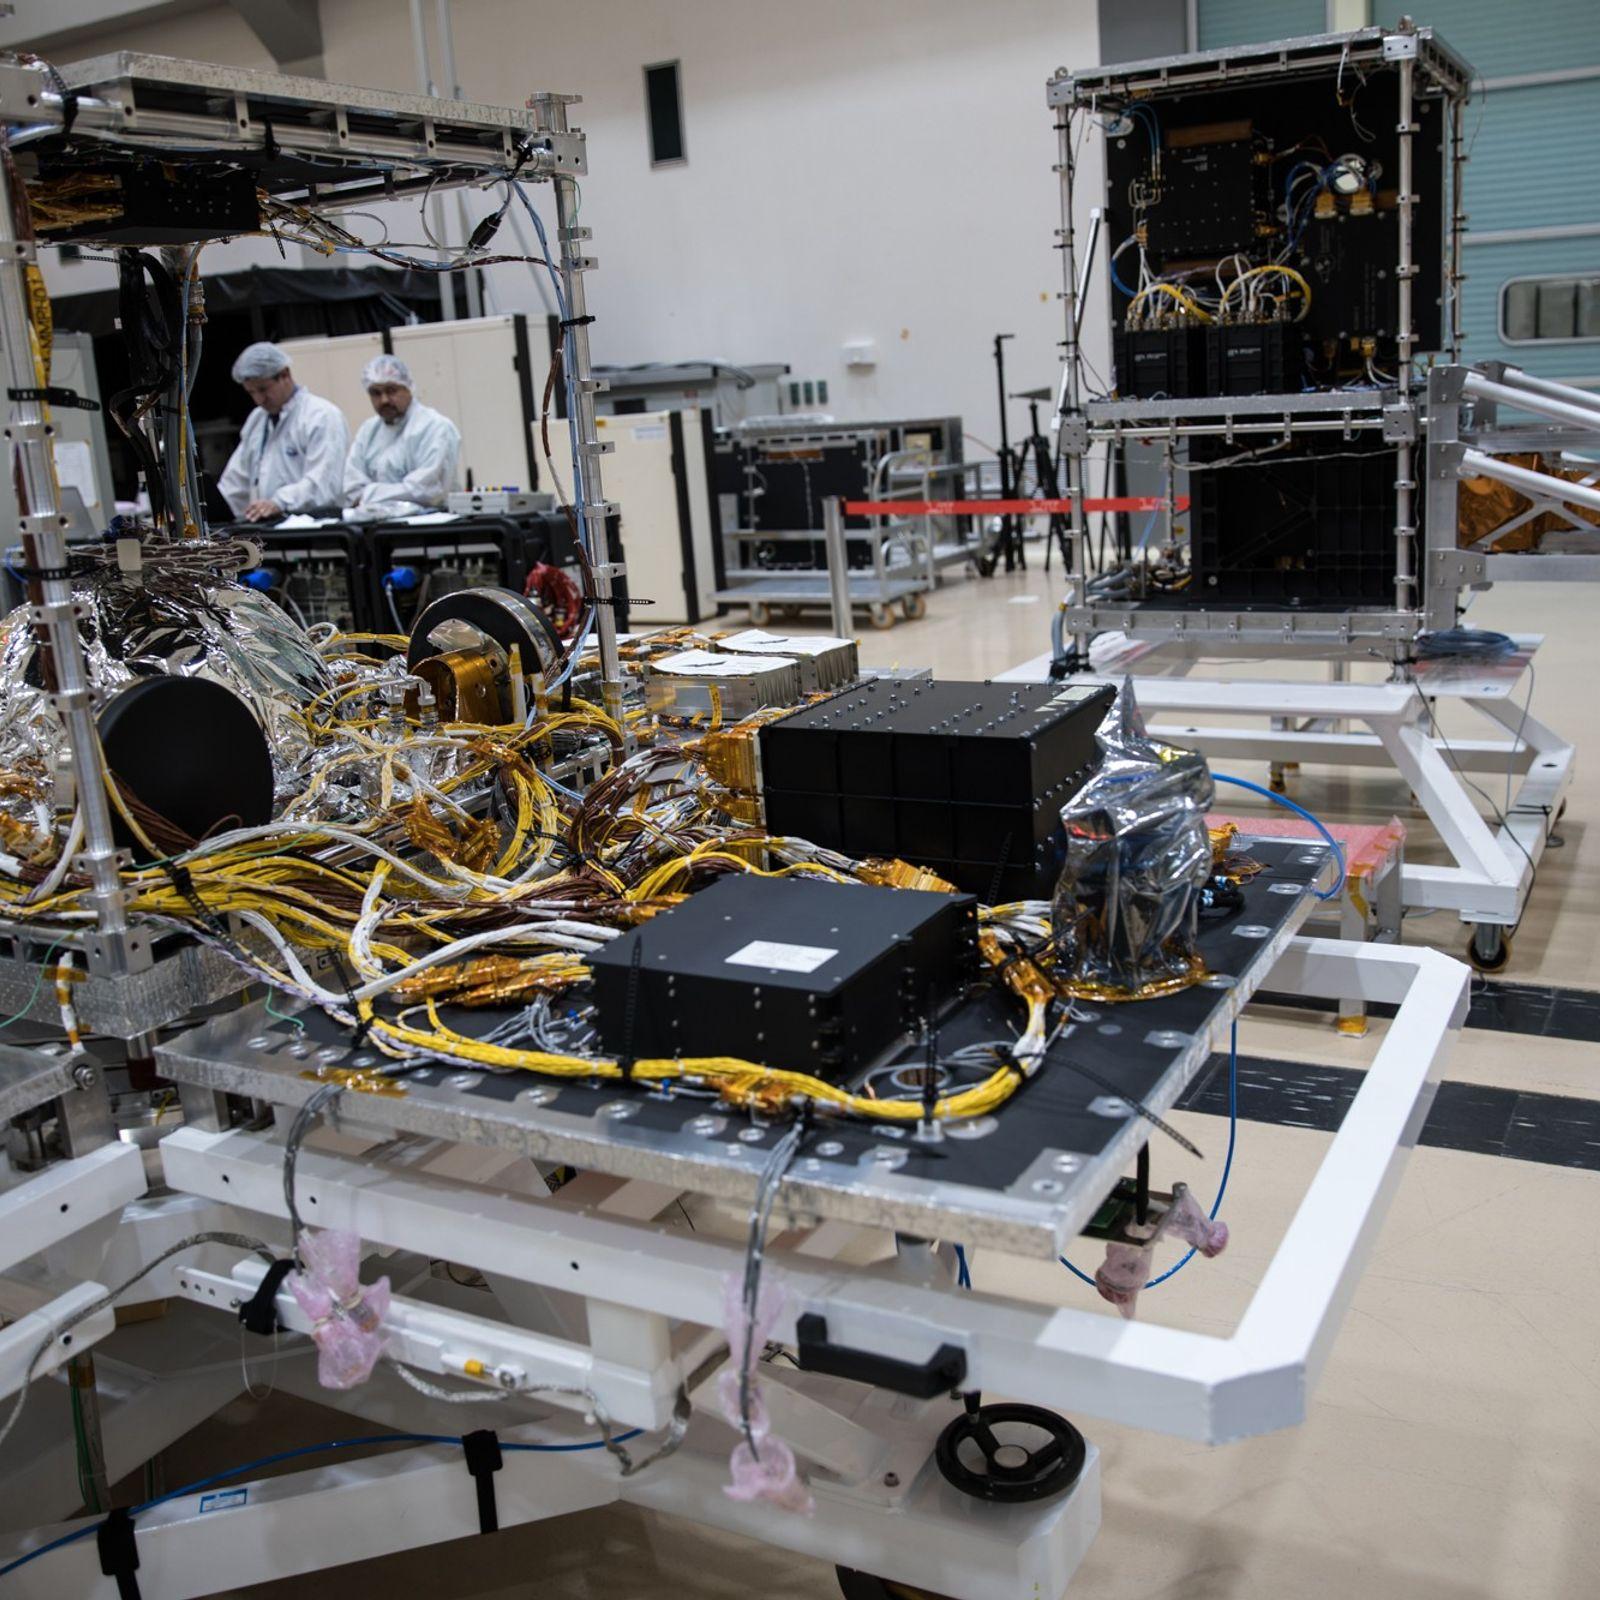 satelite-amazonia-1-inpe